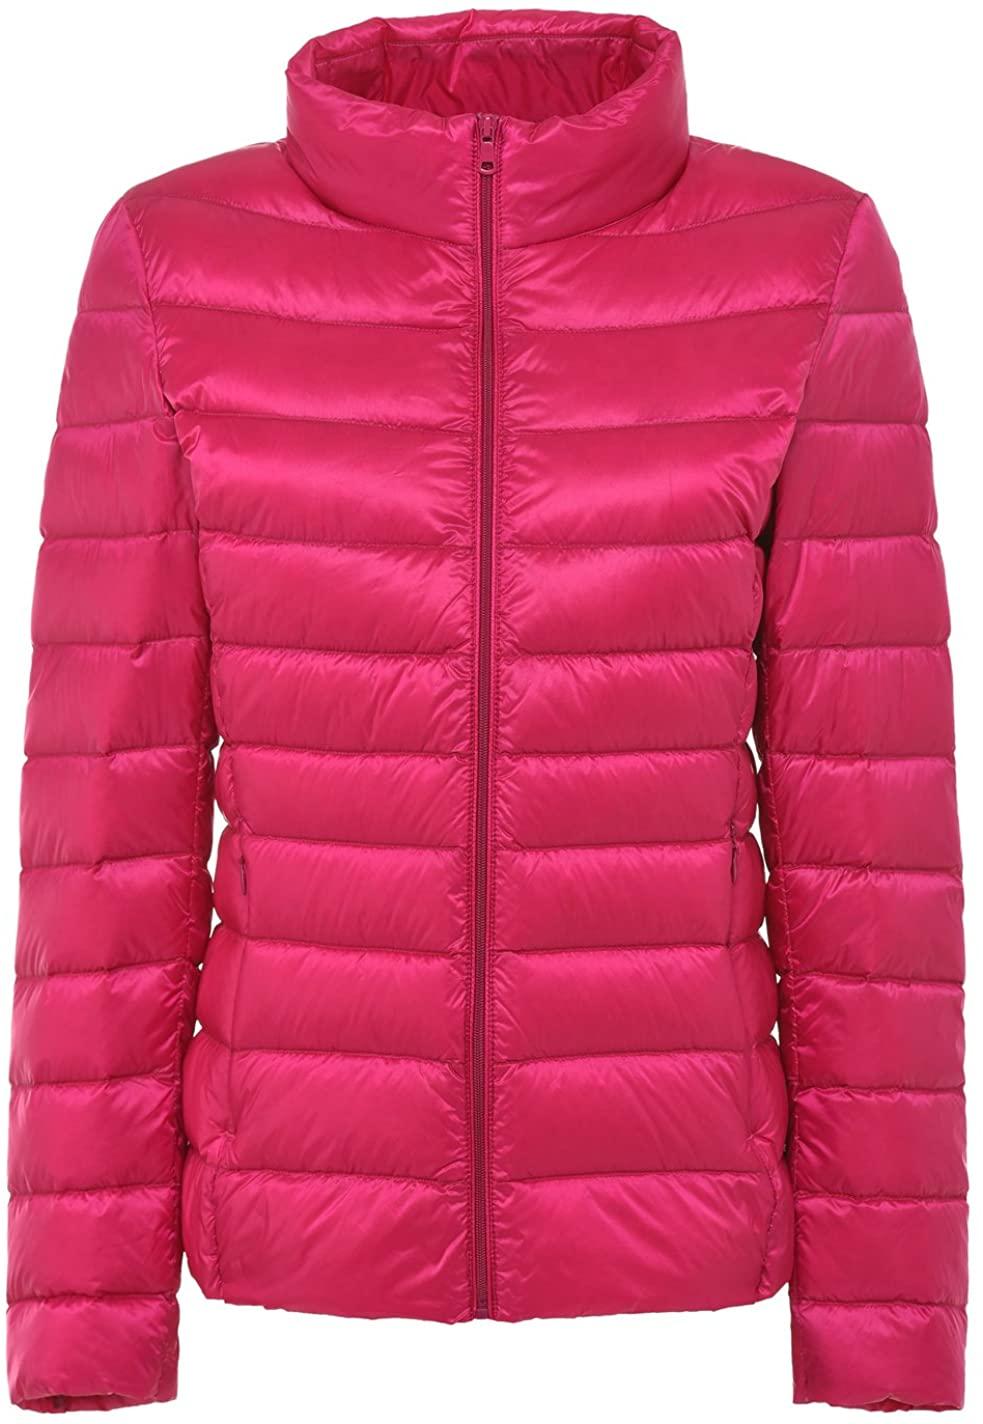 chouyatou Women's Stylish Packable Zip Ultra Lightweight Goose Down Jacket